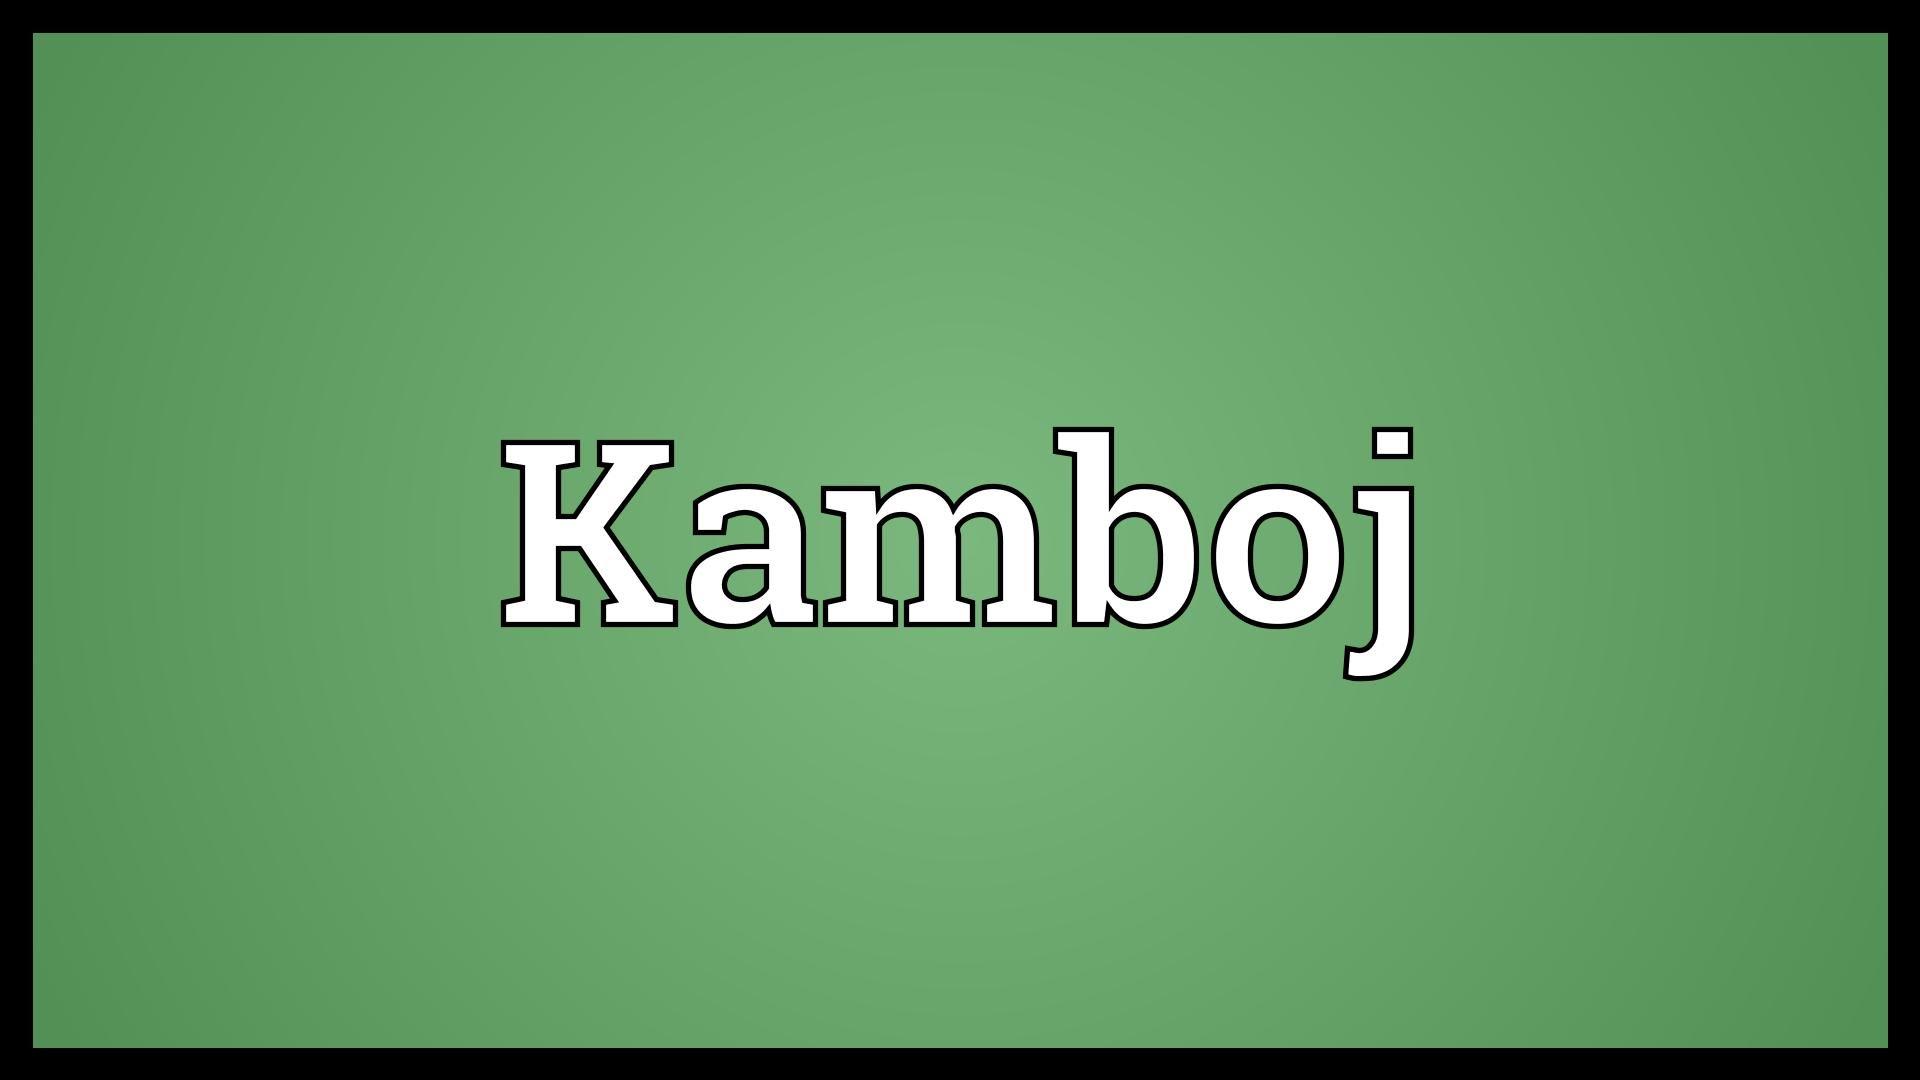 Meaning of Kamboj word